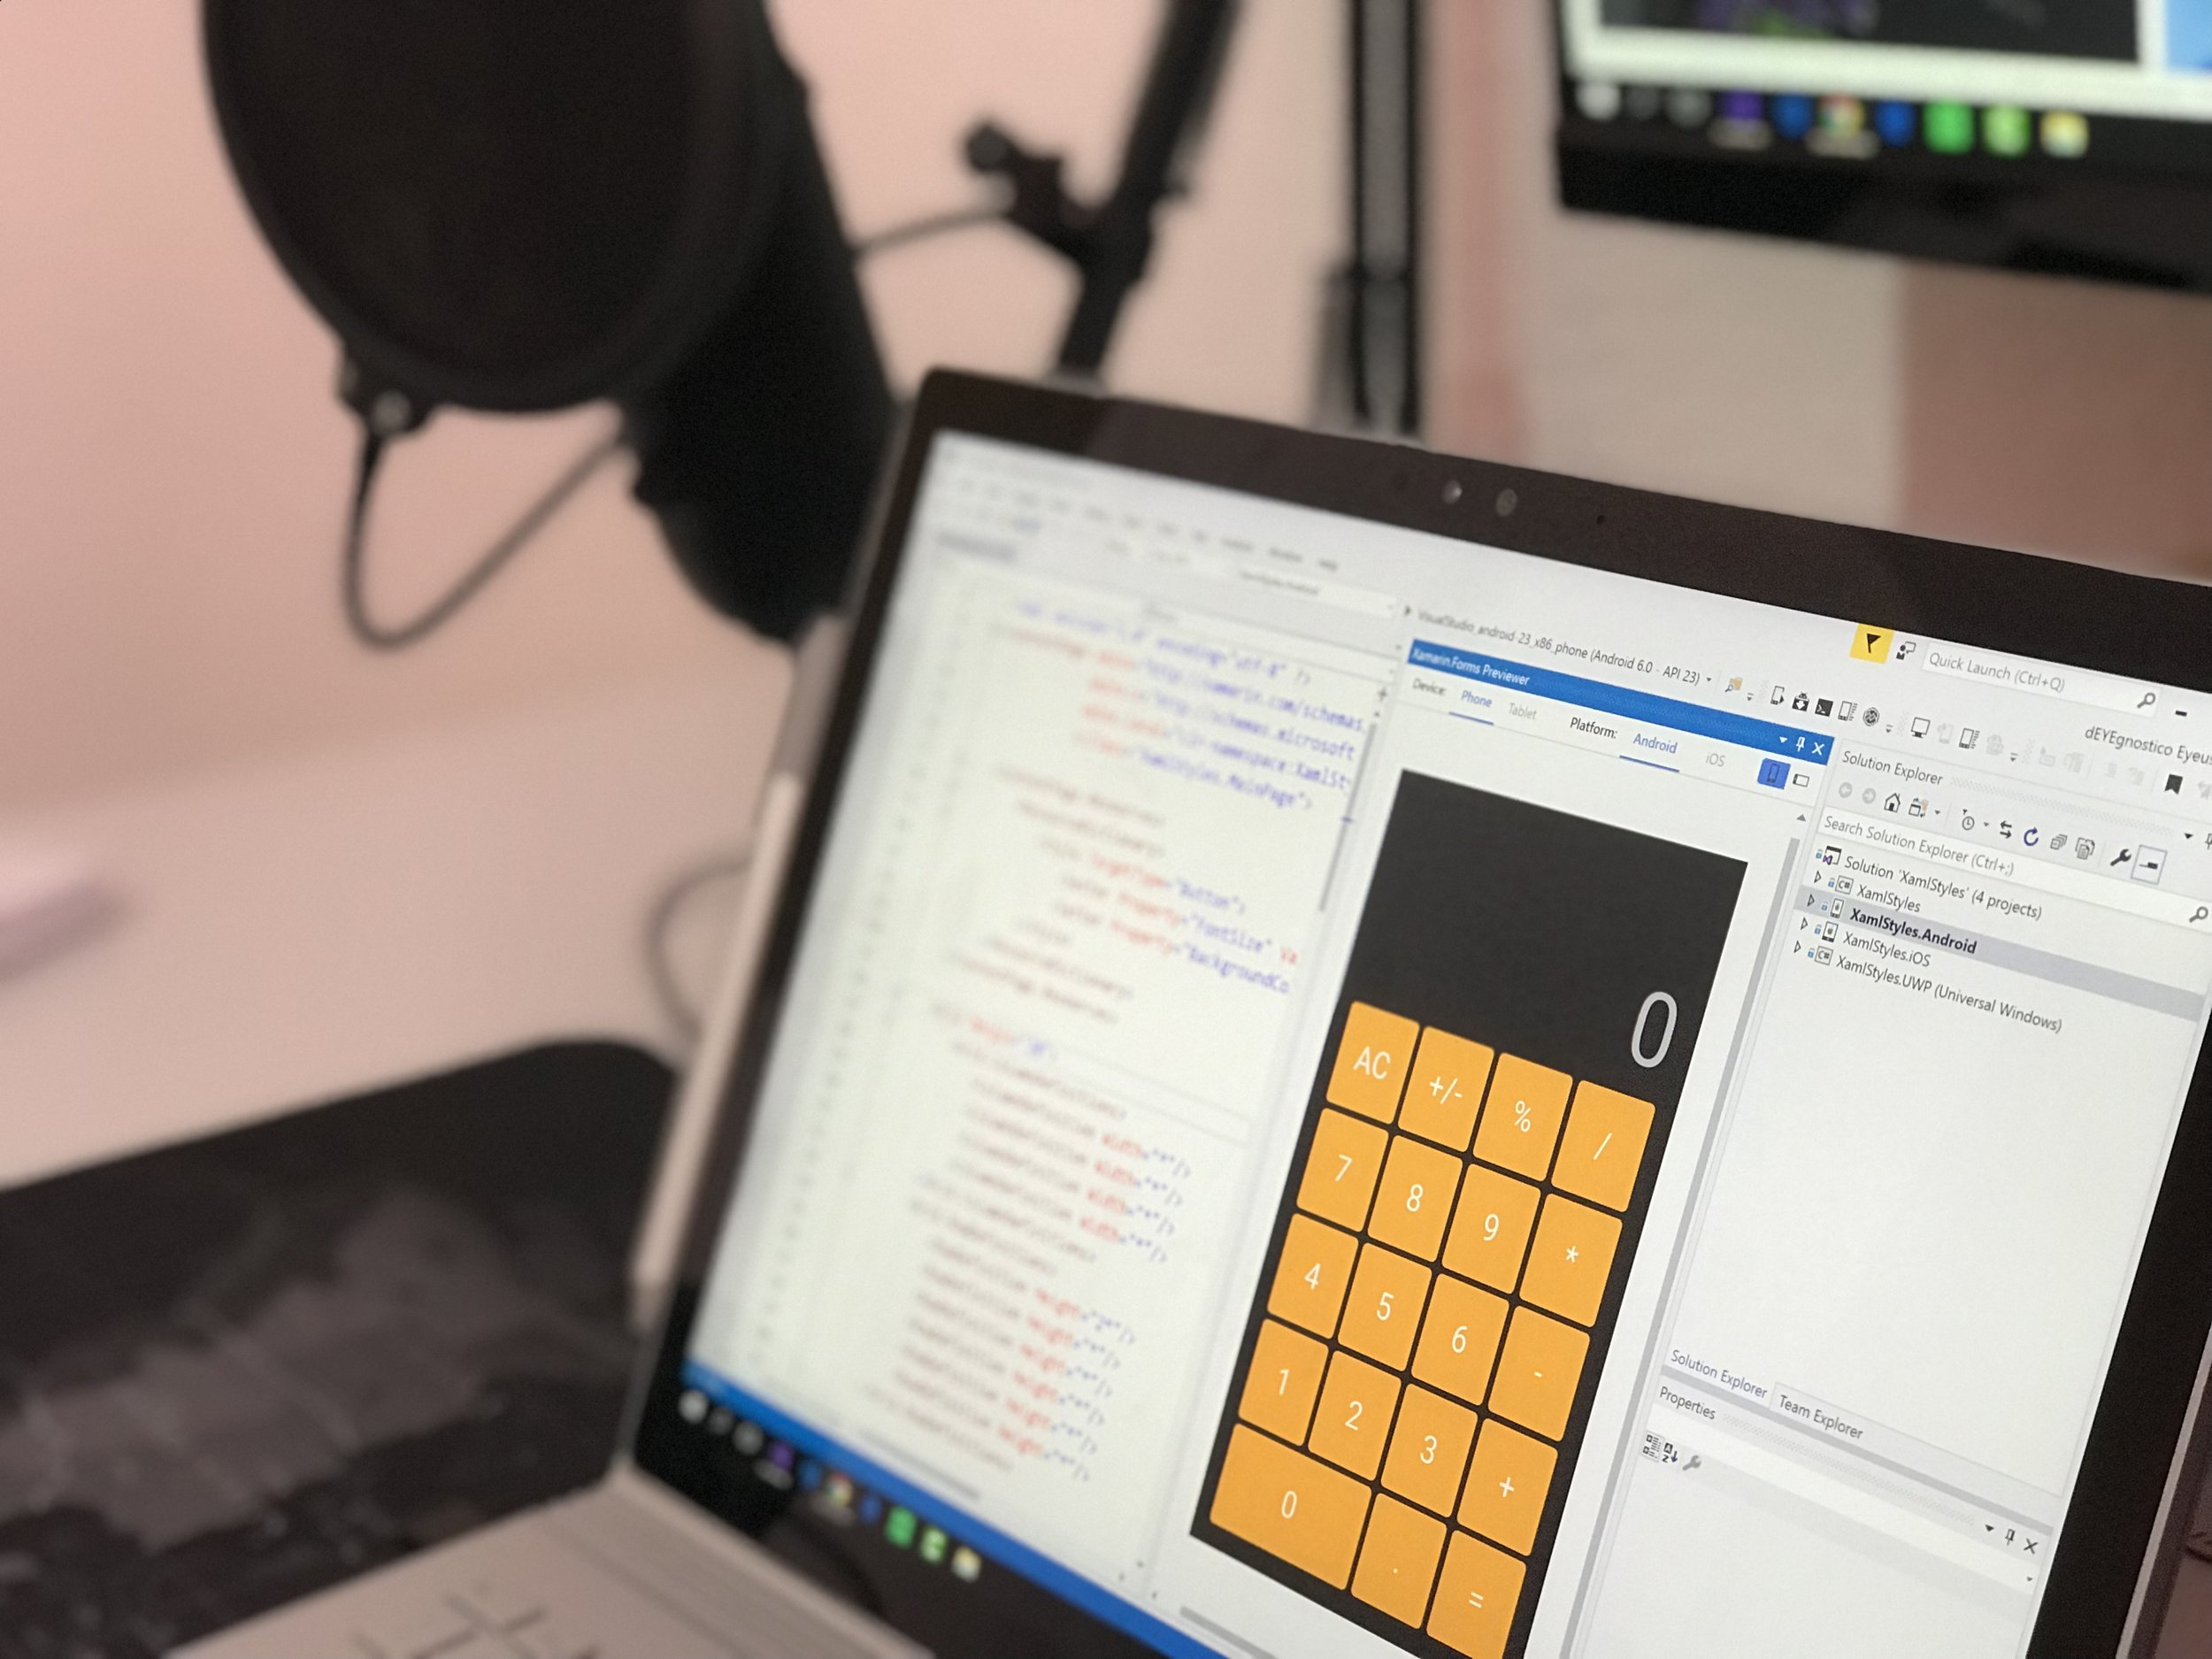 laptop-office-internet-907487.jpeg